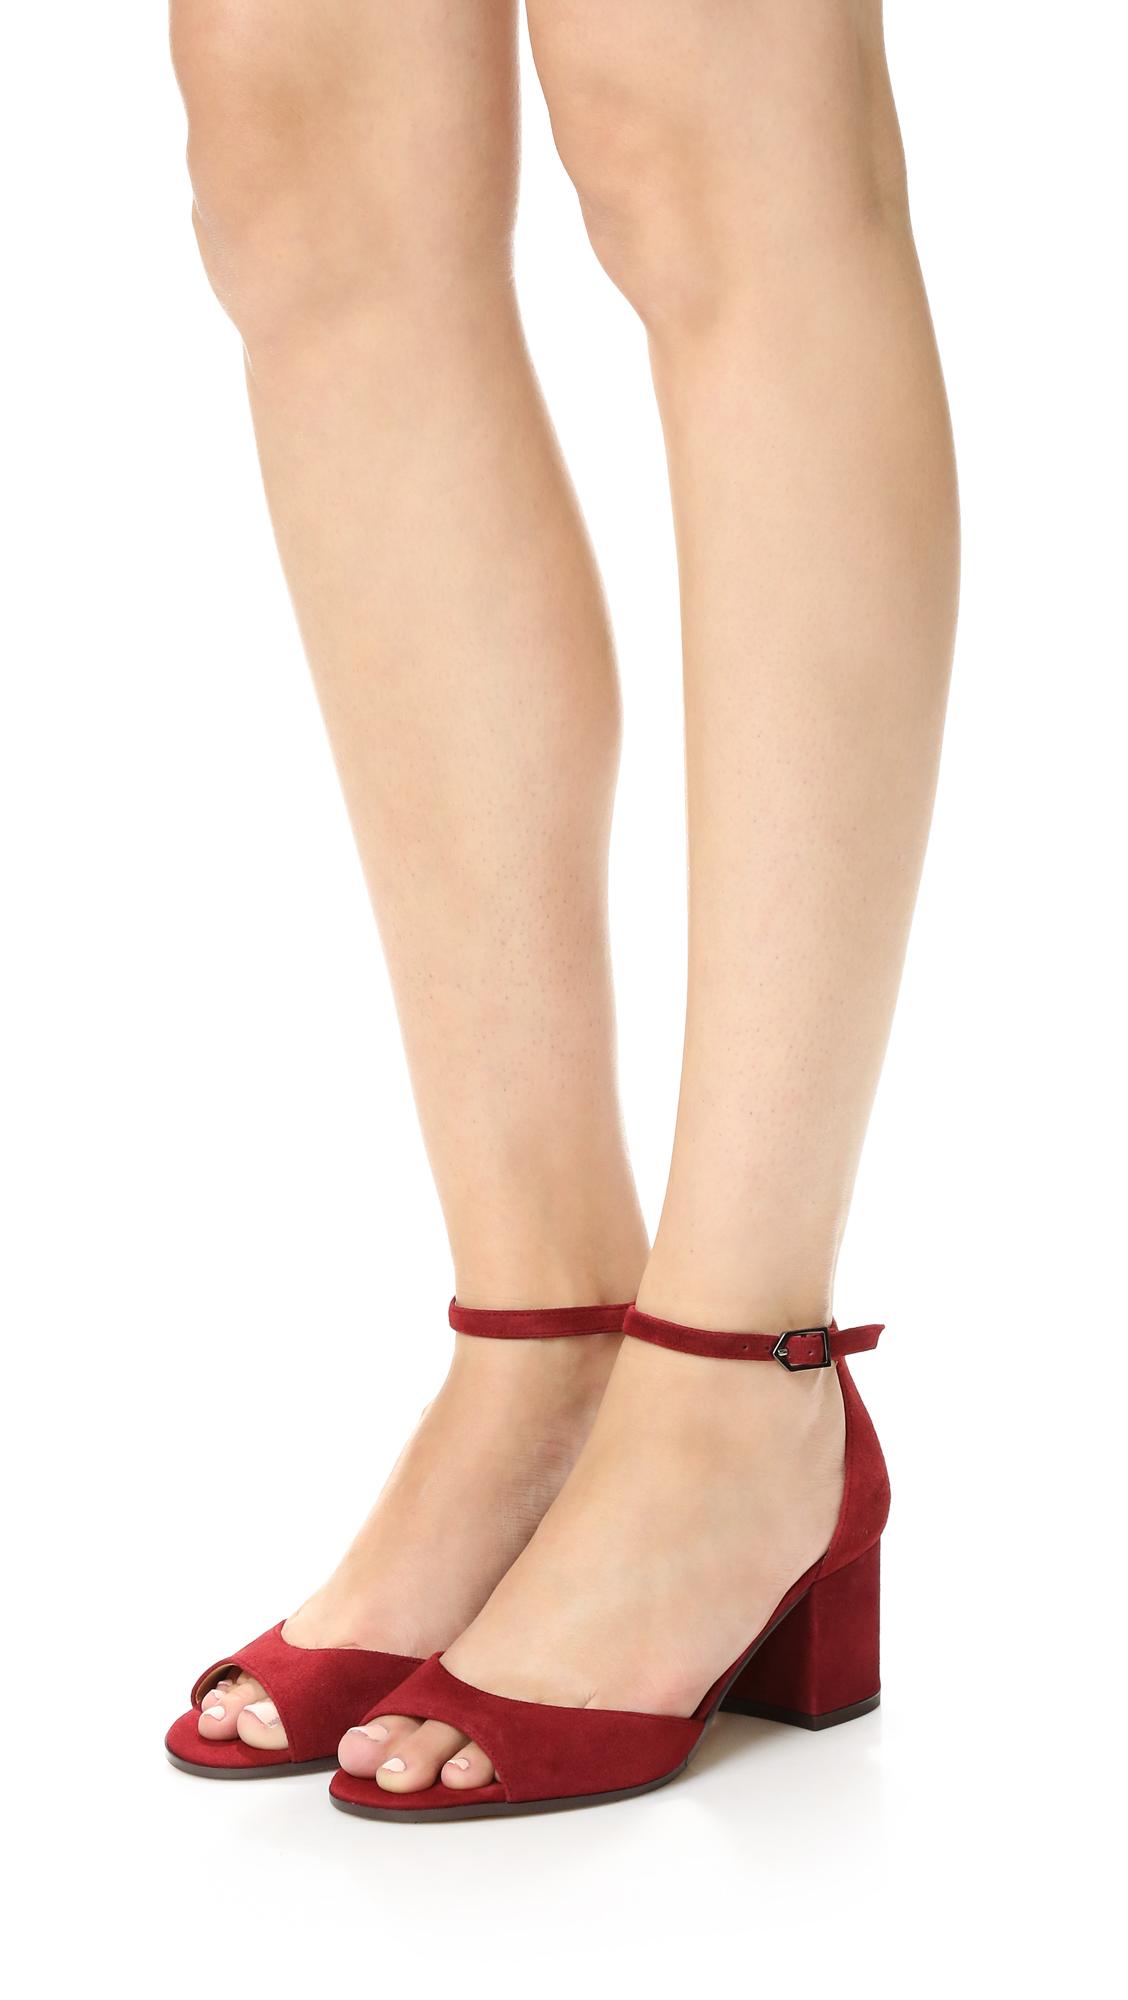 b30d31bf2b8c Sam Edelman Susie City Sandals